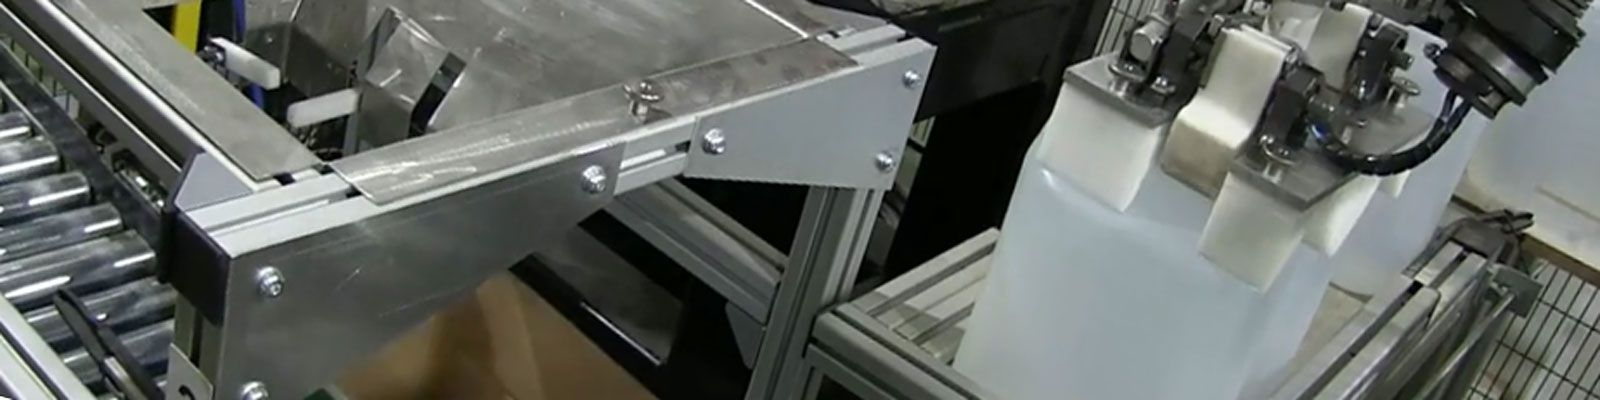 Bespoke Automated Packing